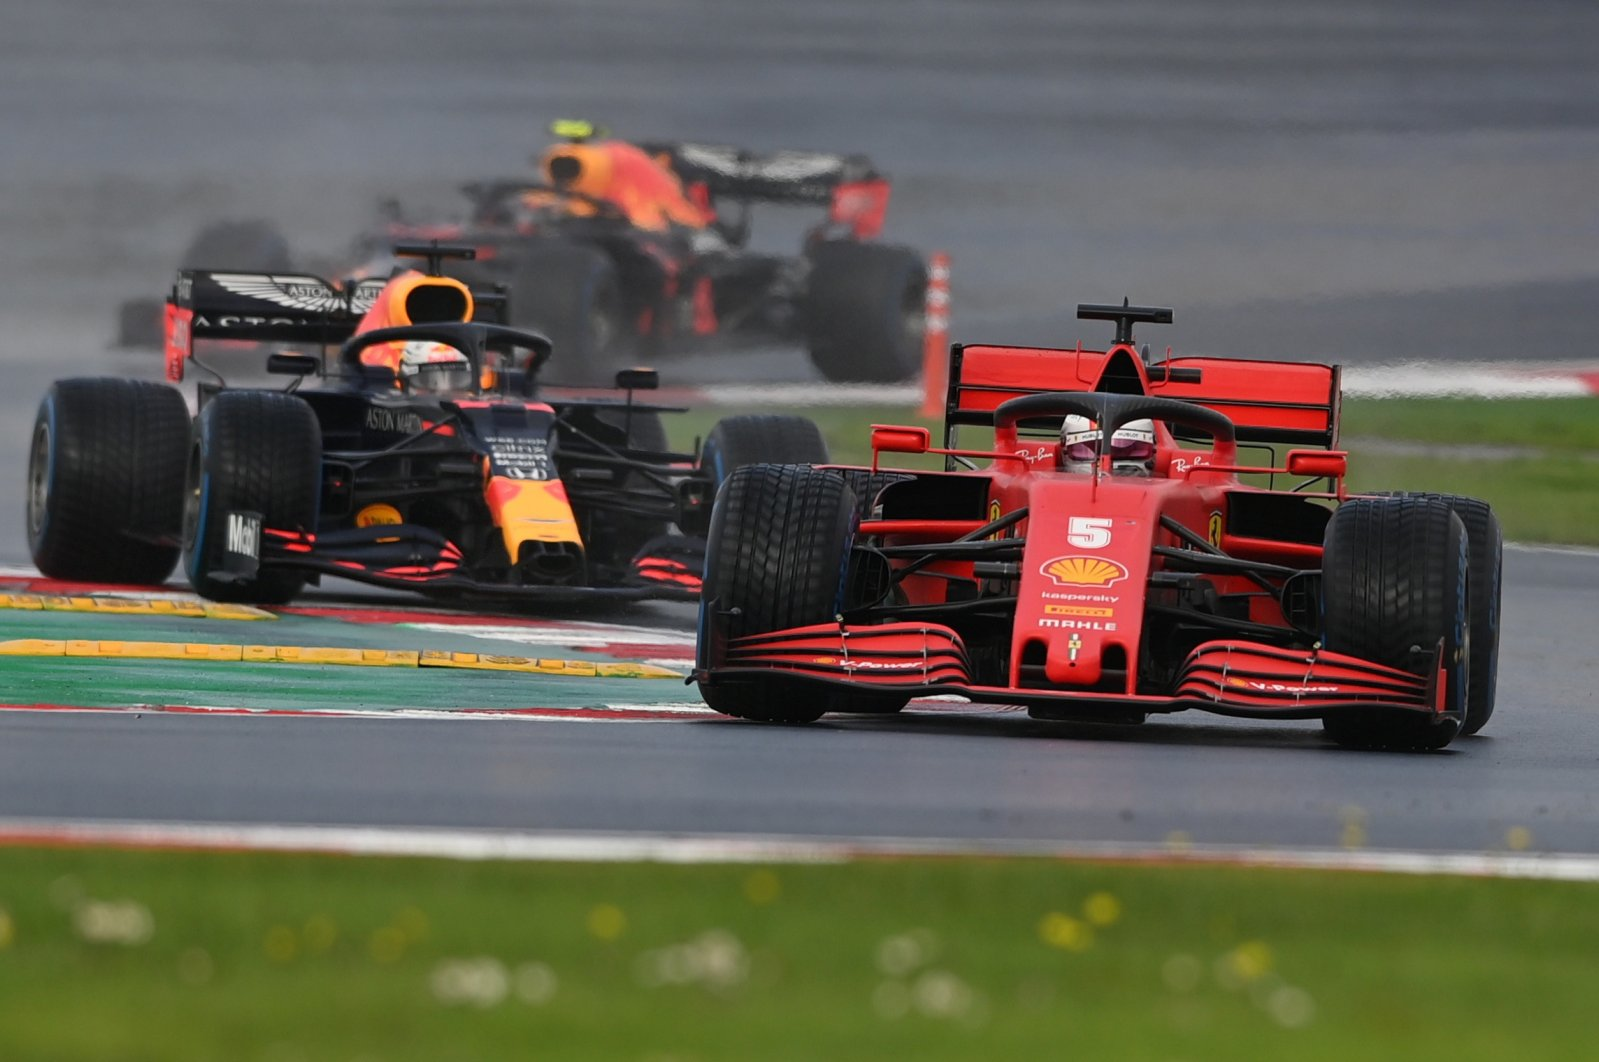 Ferrari's Sebastian Vettel and Red Bull's Max Verstappen in action during the Formula One Turkish Grand Prix at Istanbul Park, Istanbul, Turkey, Nov. 15, 2020. (Reuters Photo)